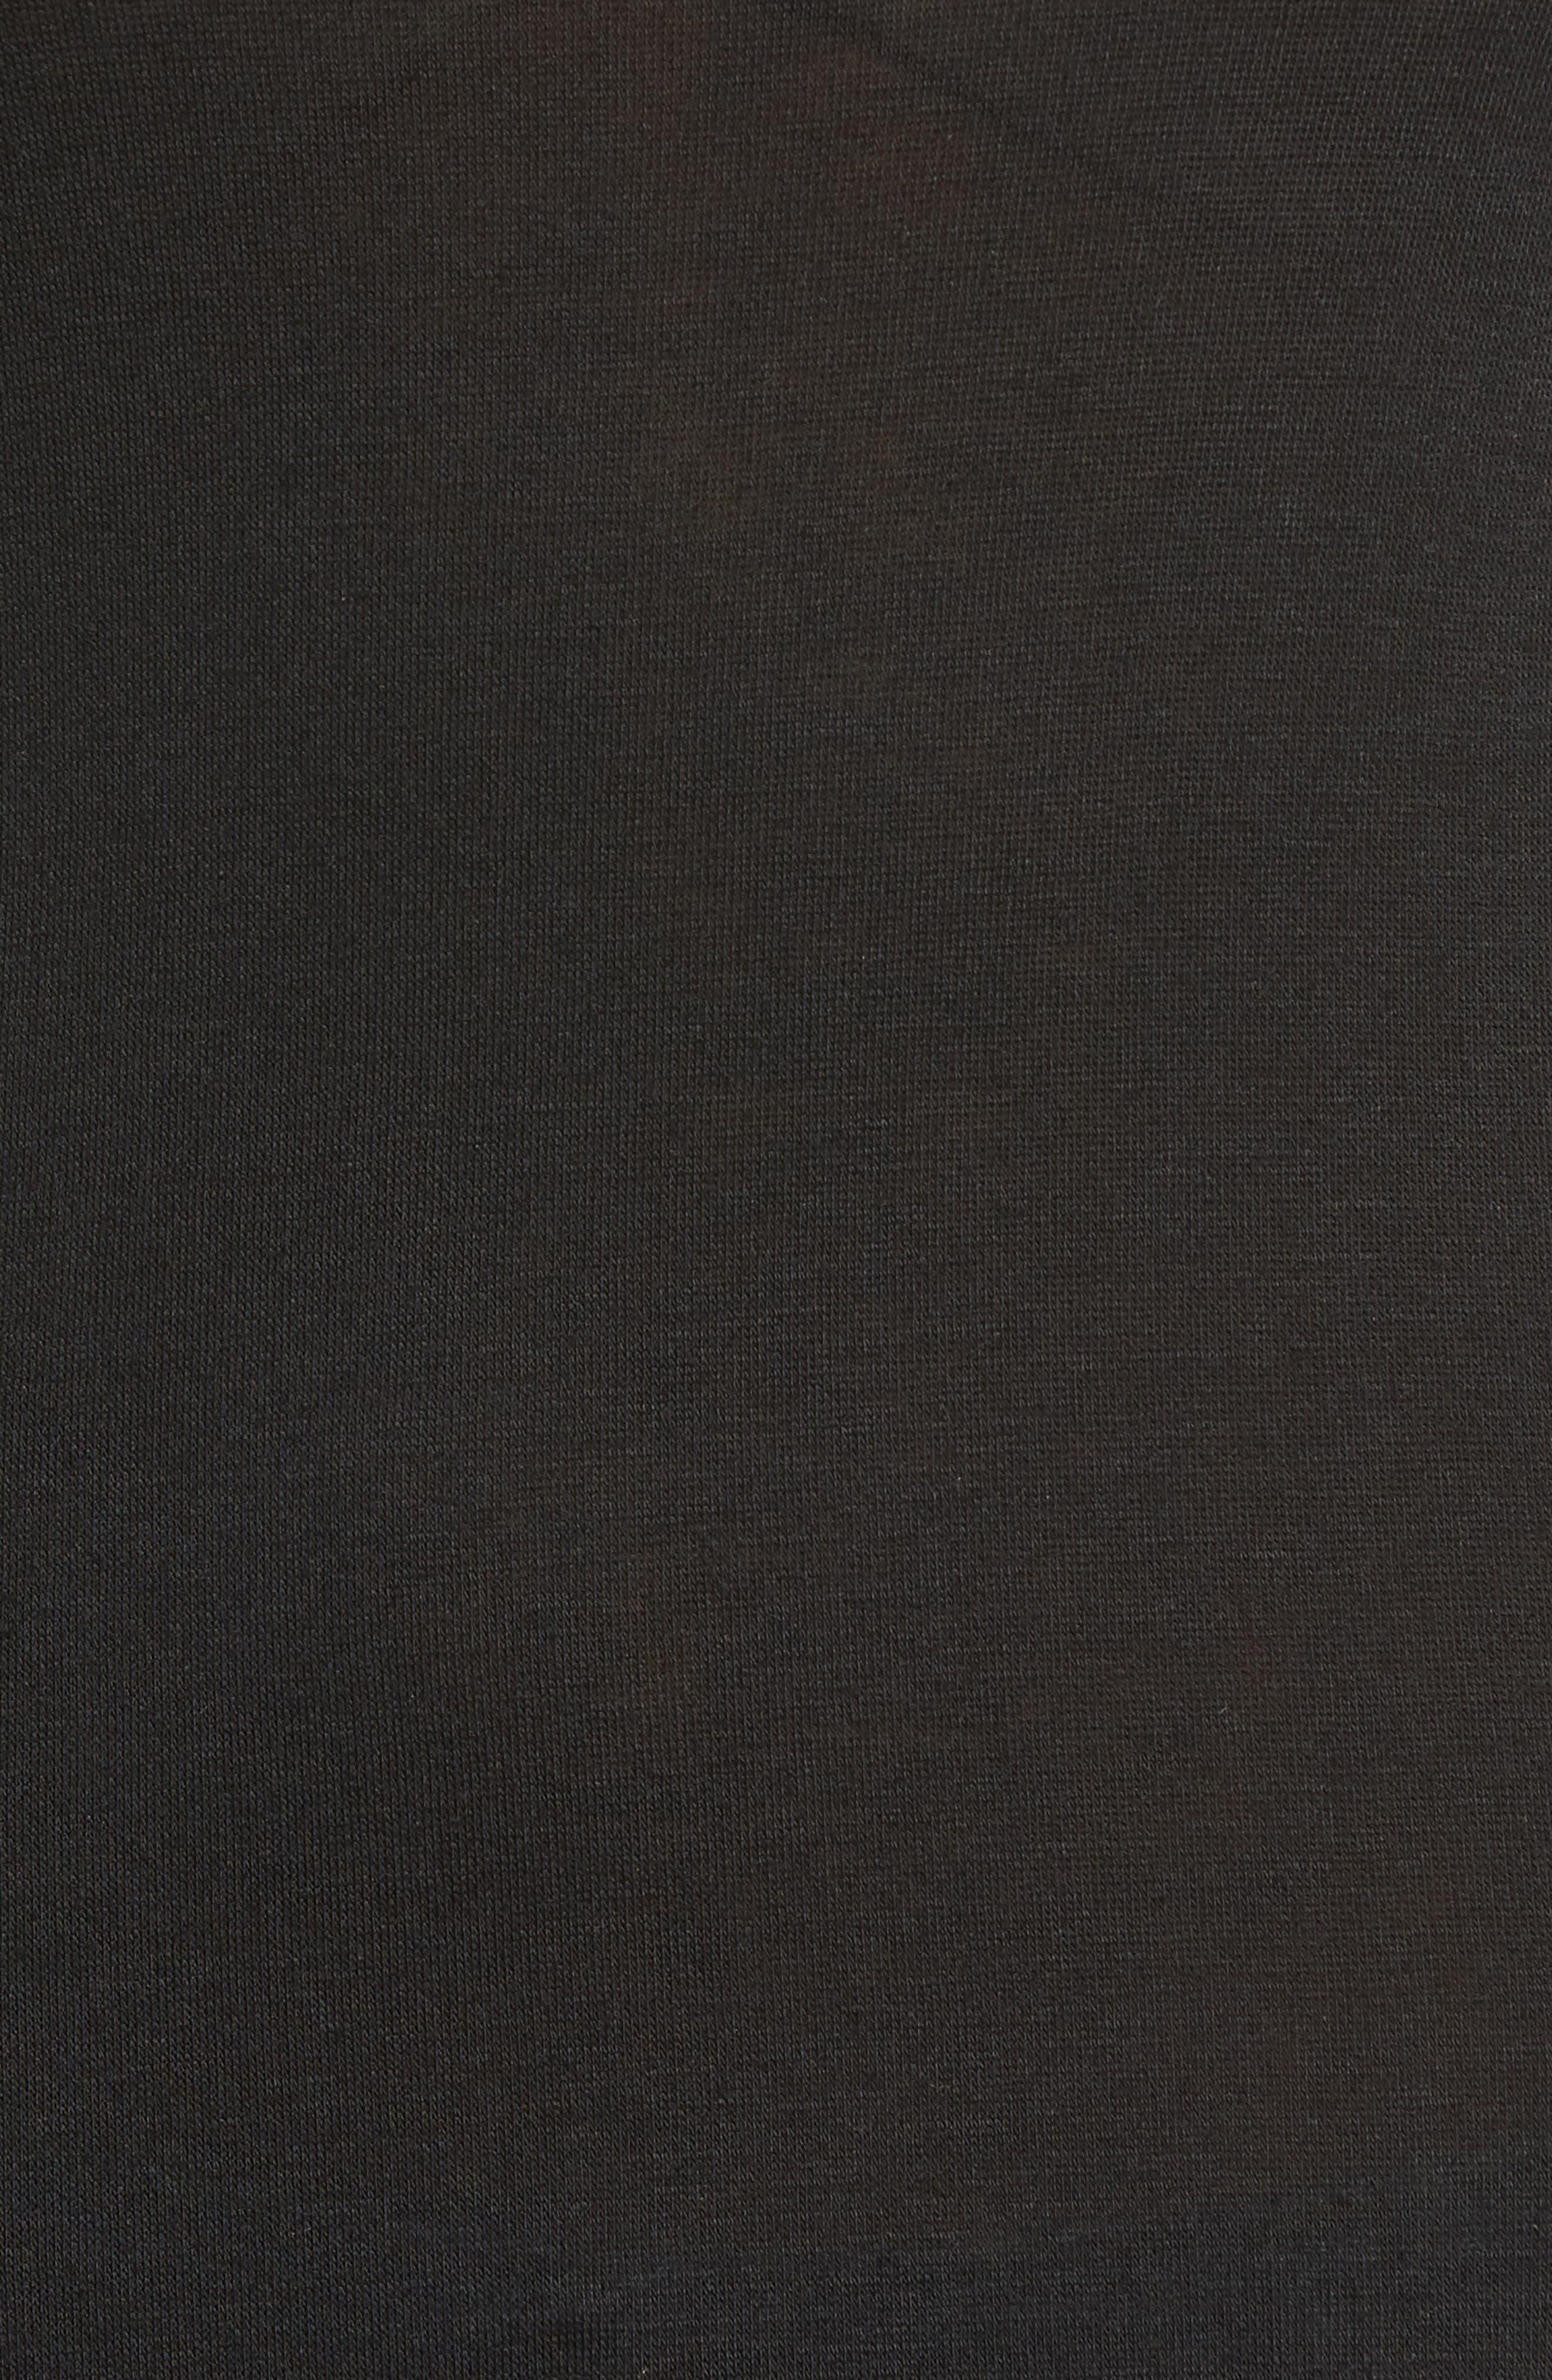 Sheer Knit Tee,                             Alternate thumbnail 5, color,                             001